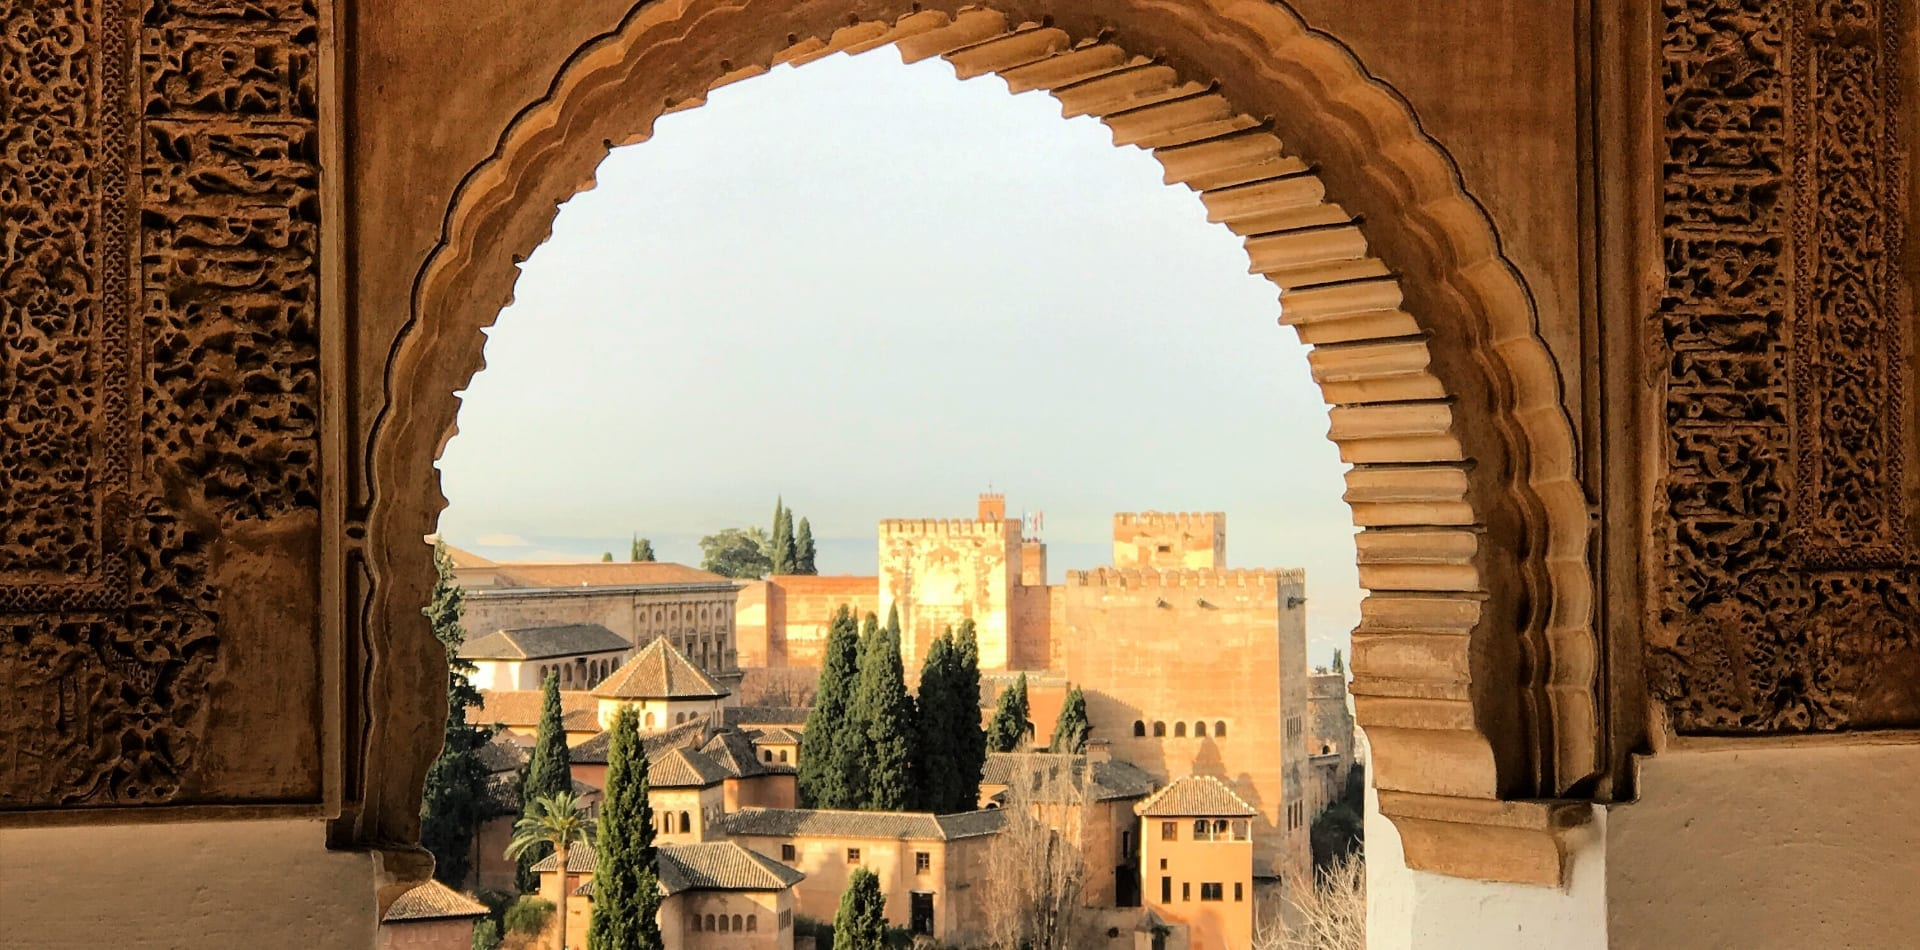 Alhambra de Granada in Spain